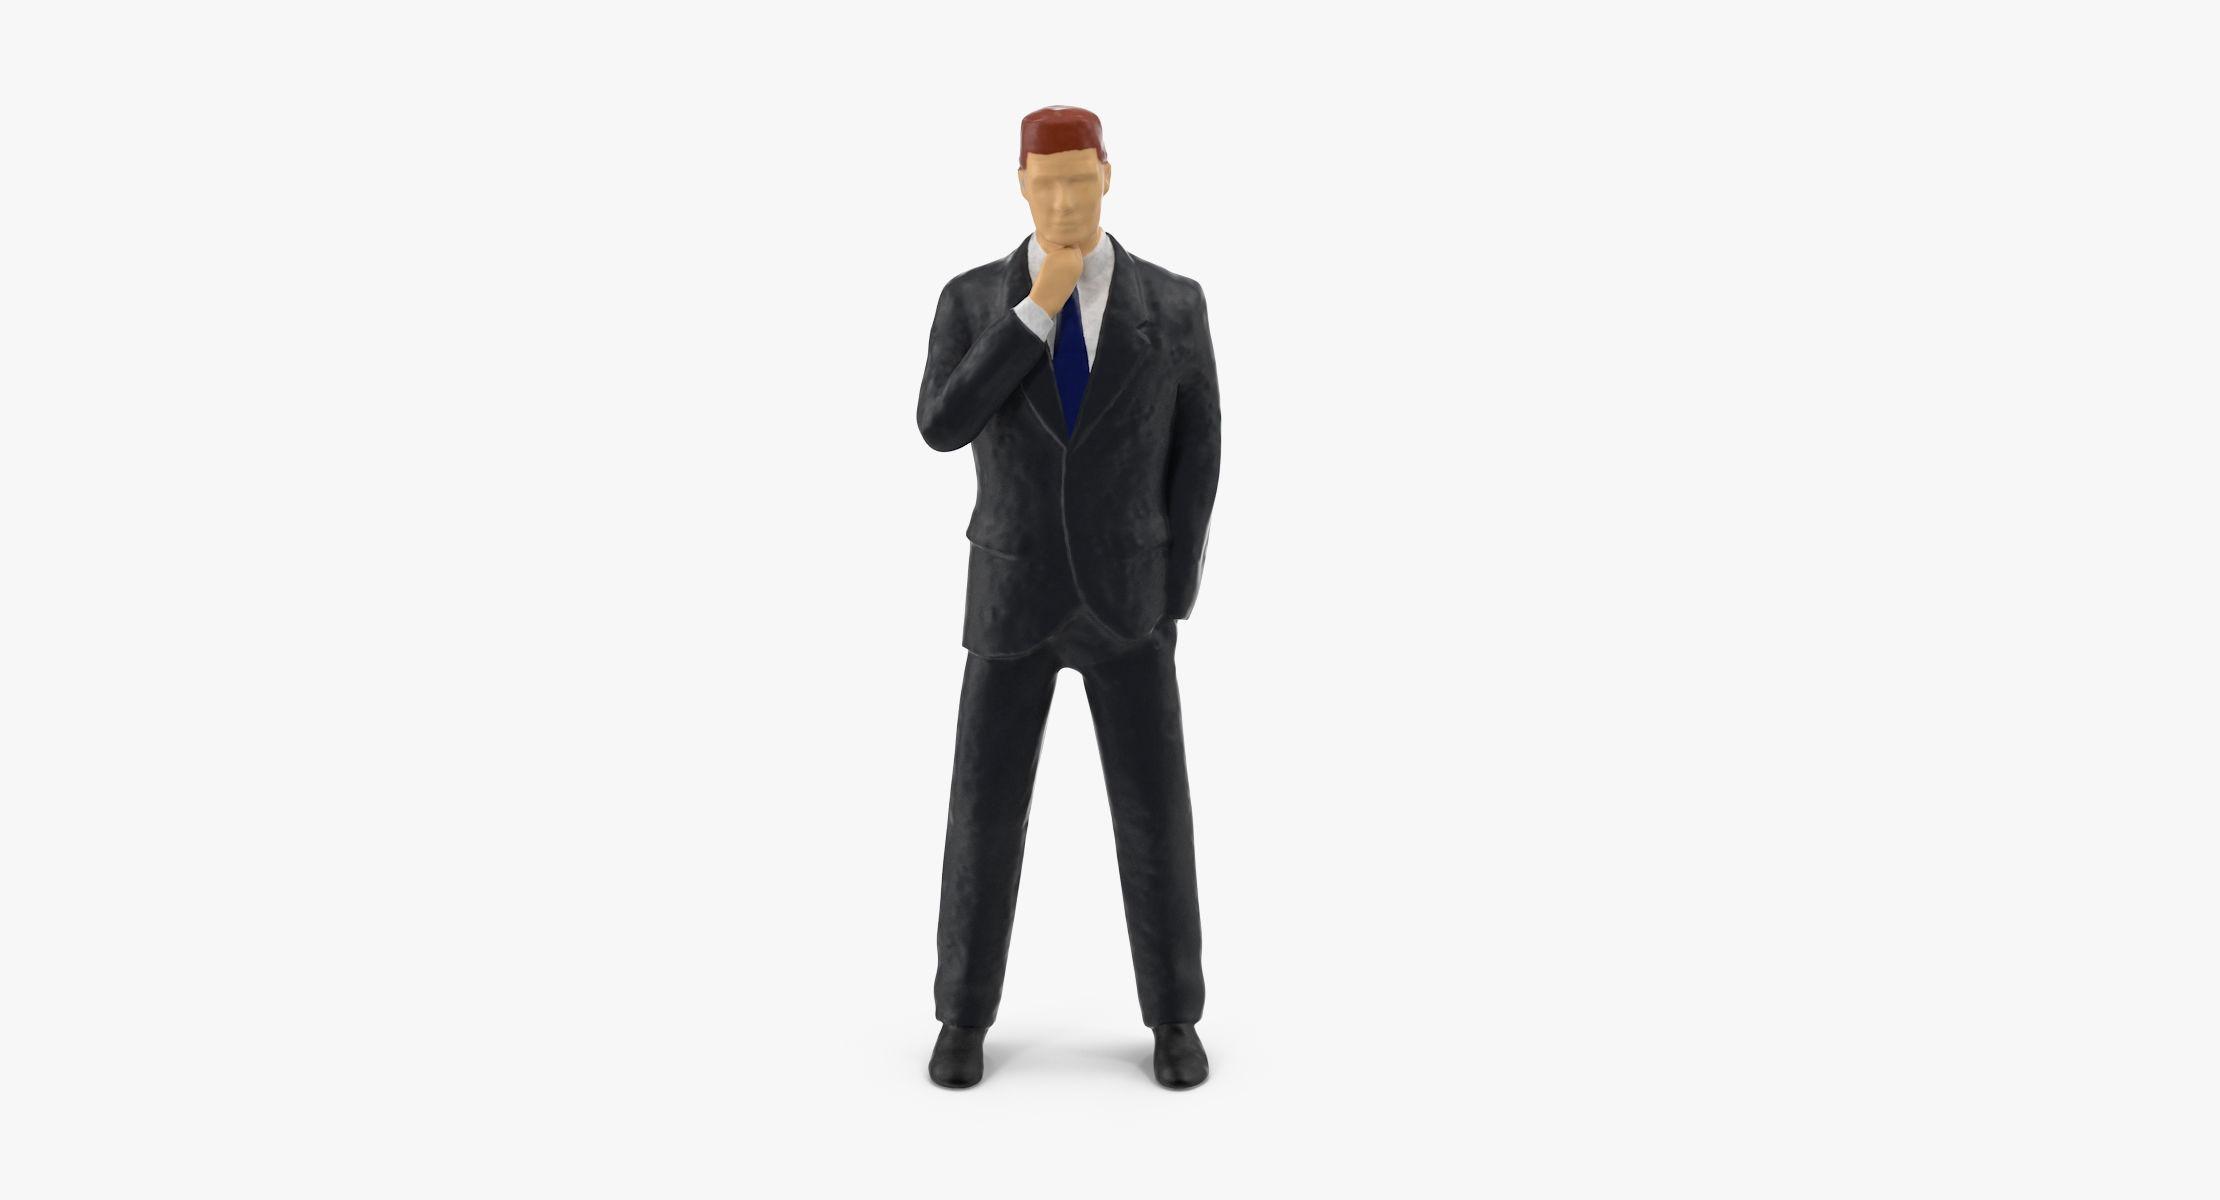 Miniature Business Man 05 - reel 1